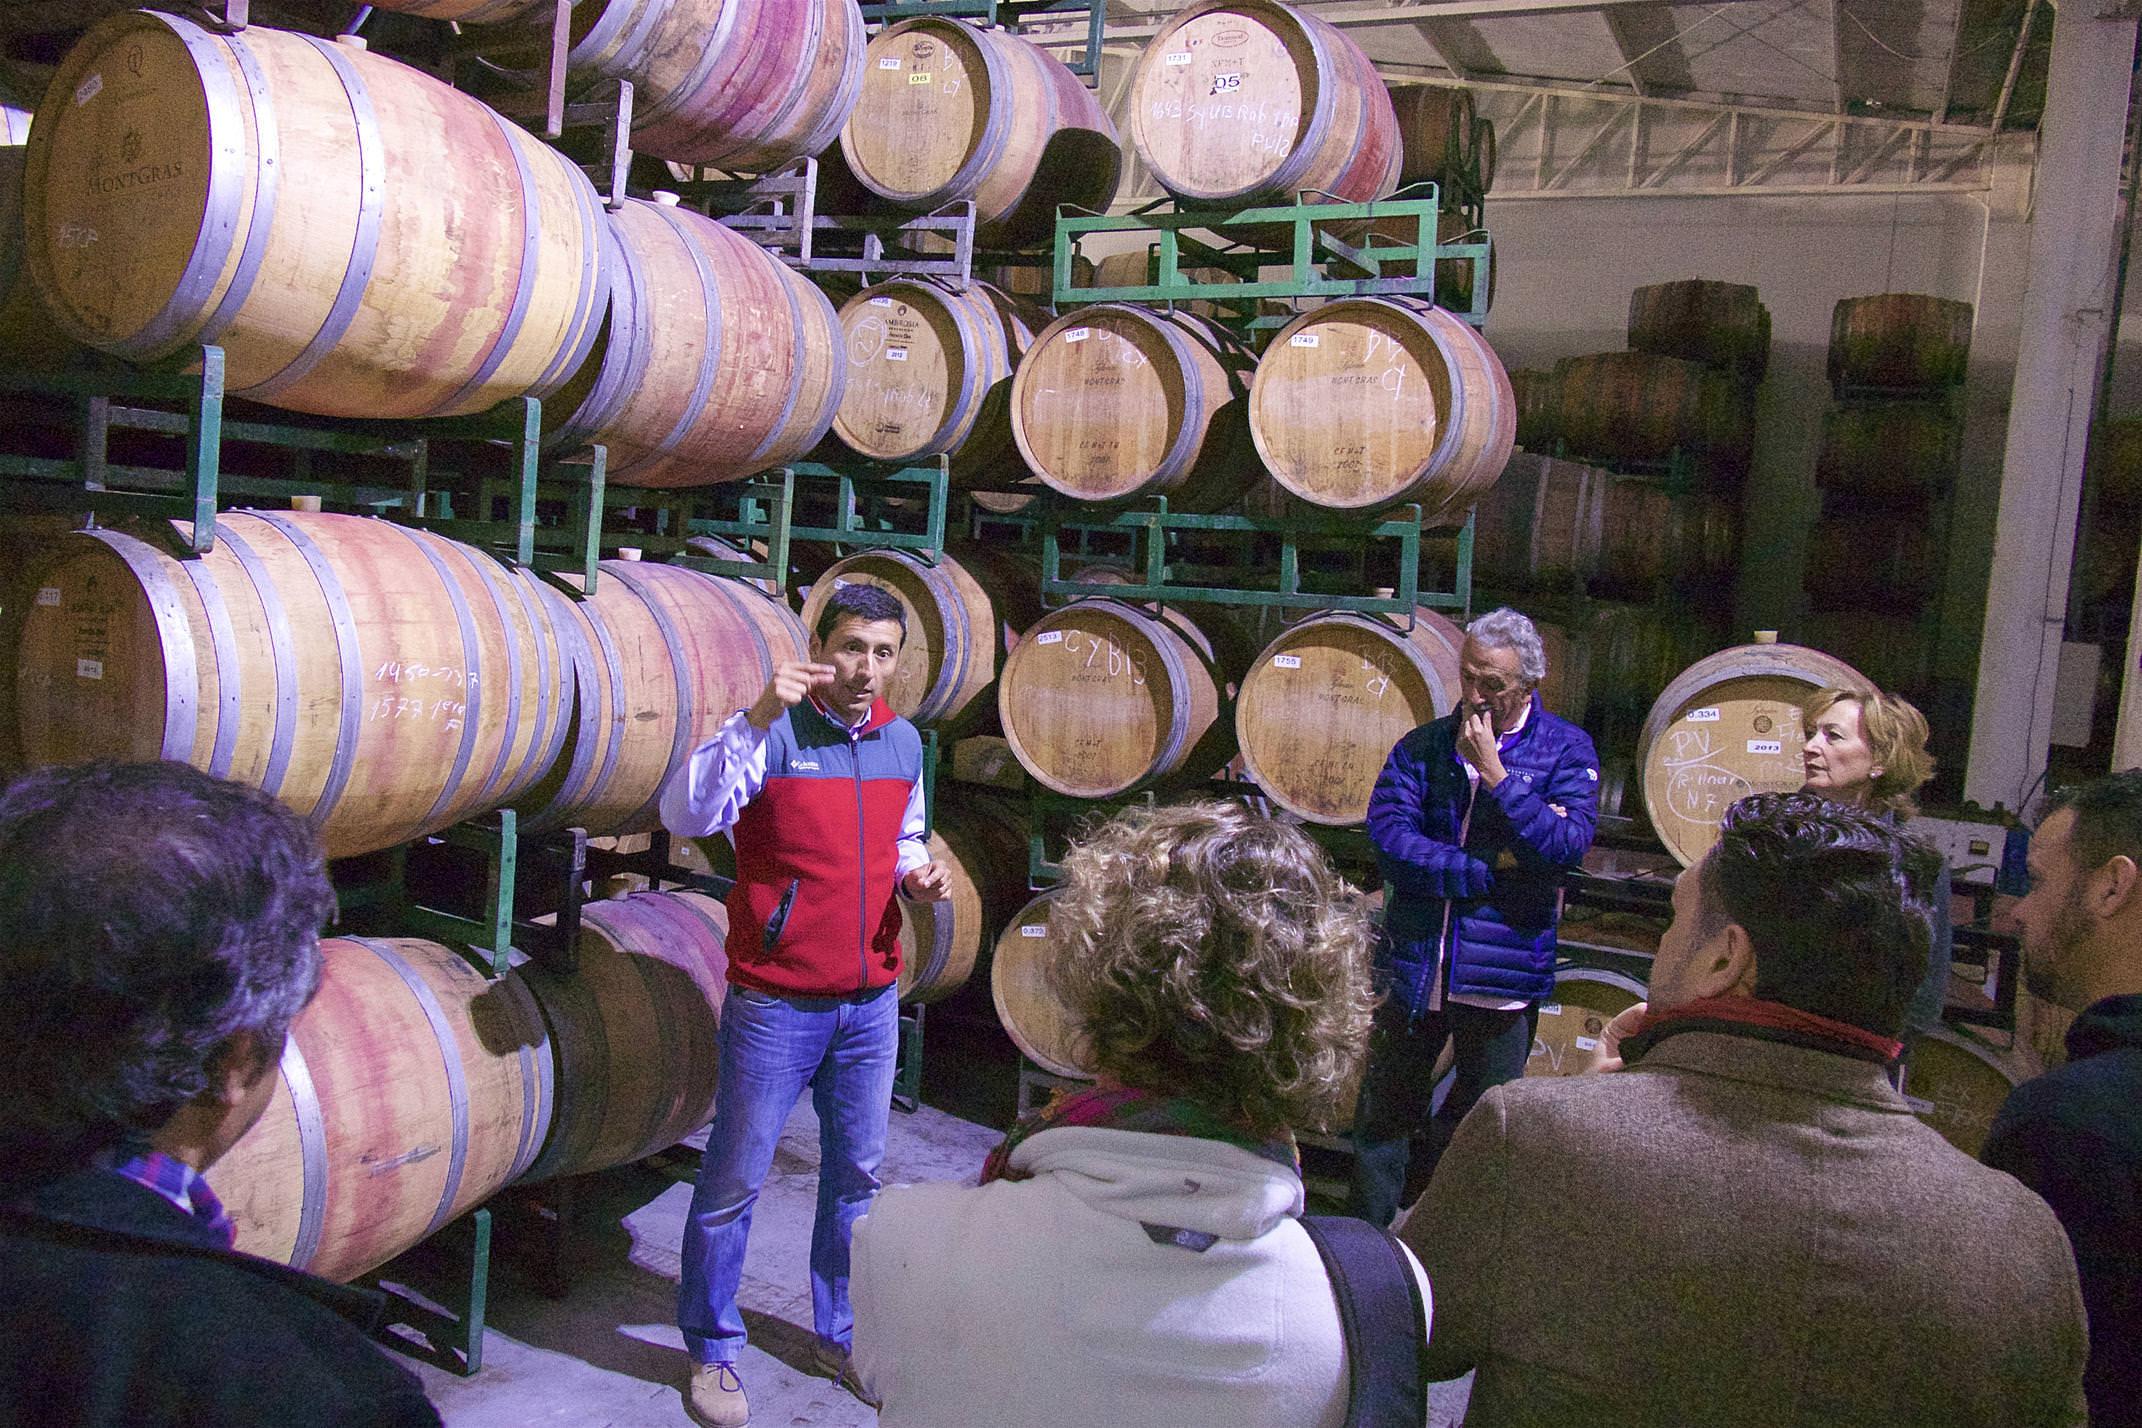 Chile winelands santa cruz montgras winery discussing the barrels